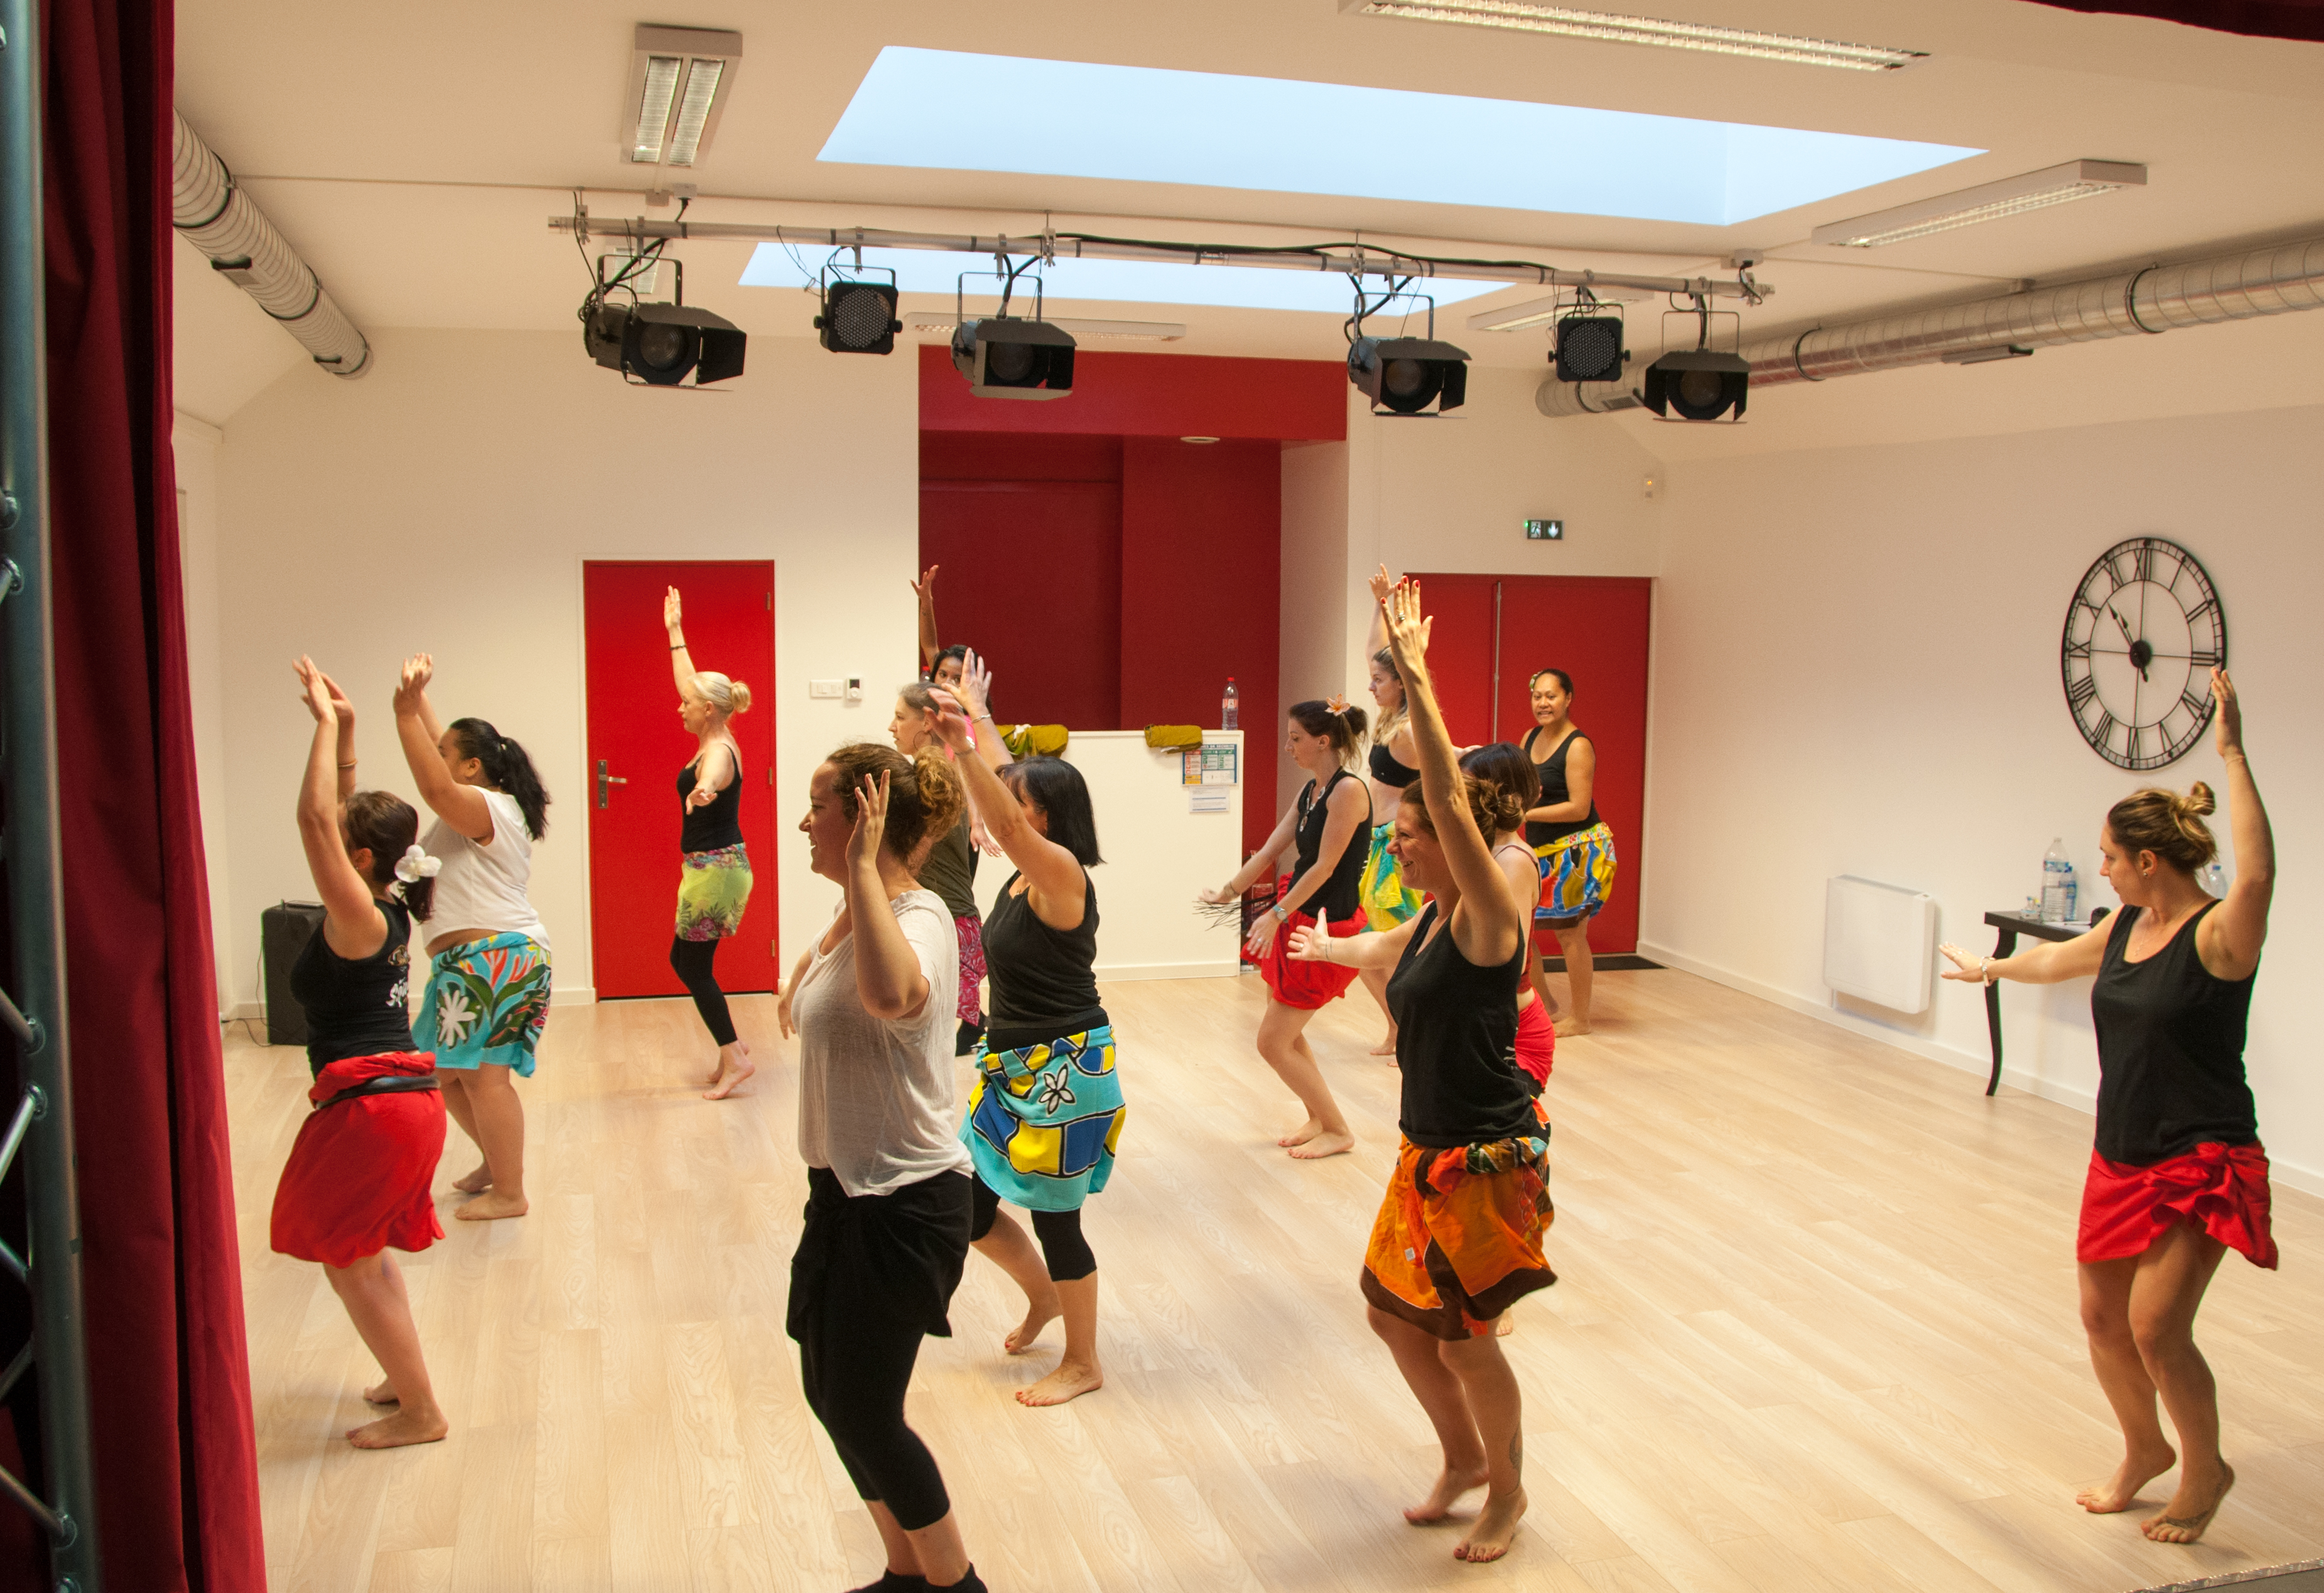 groupe de stagiaires danses polynésiennes Ori tahiti